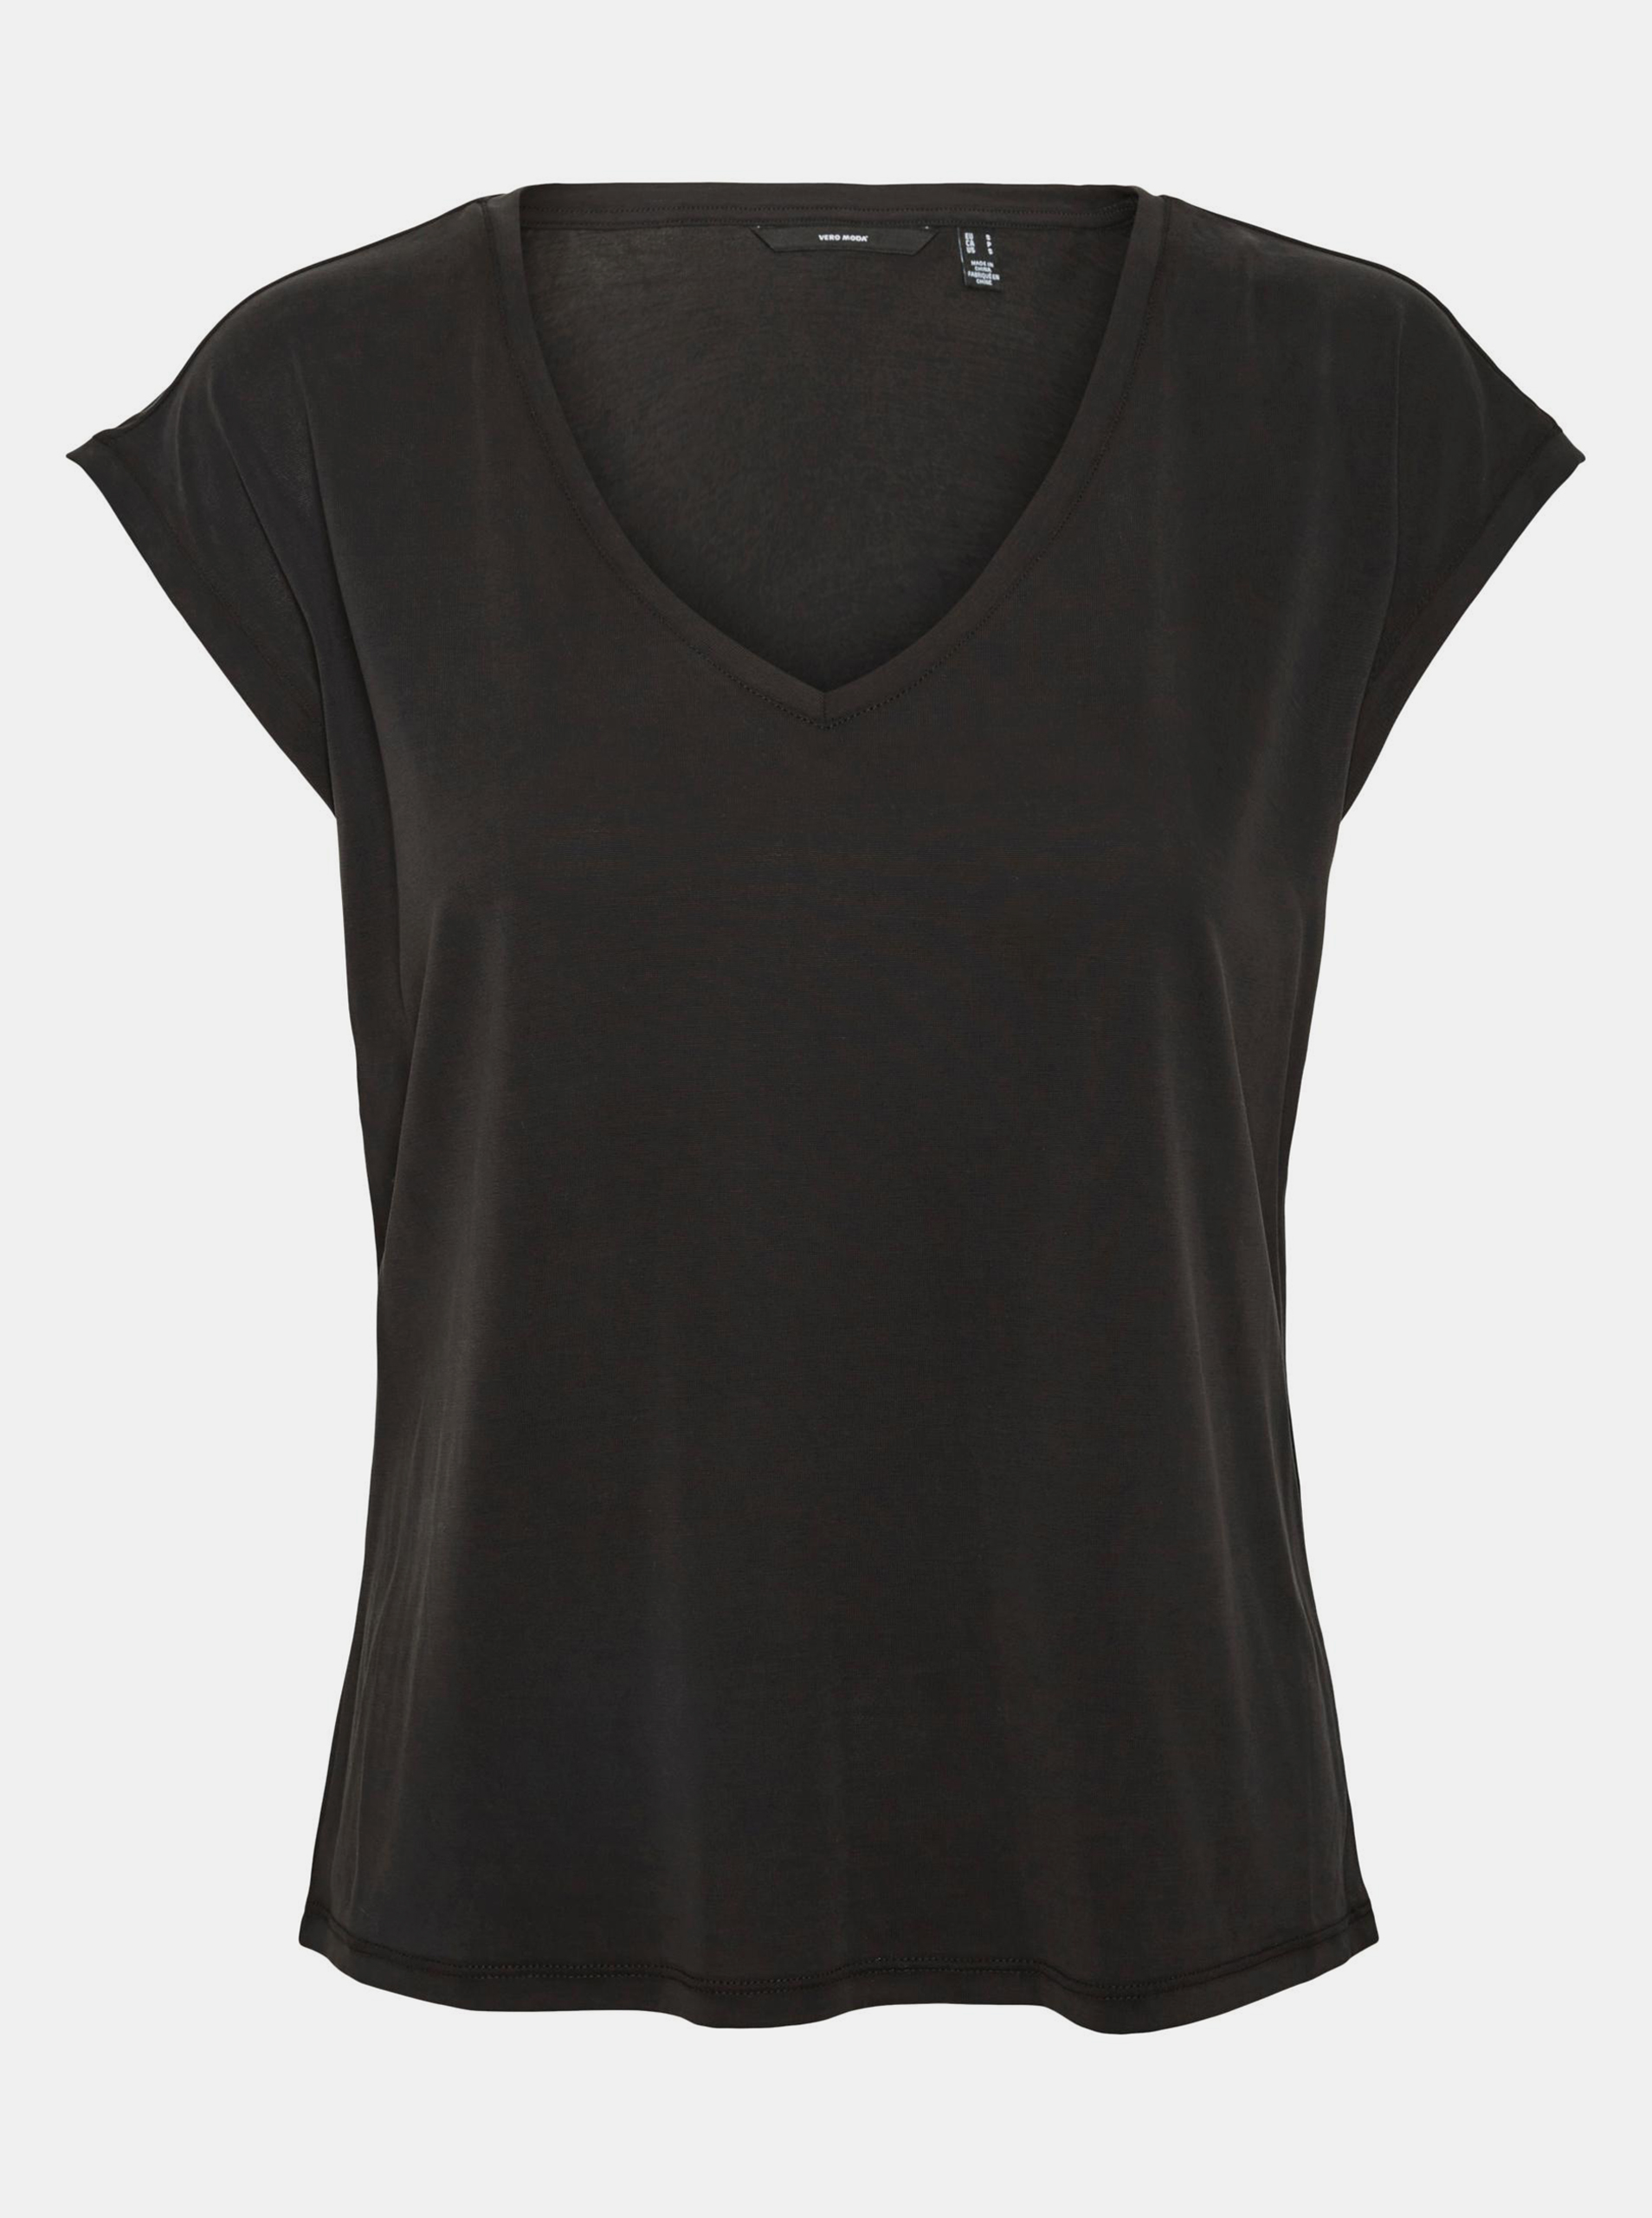 Vero Moda black T-shirt Filli